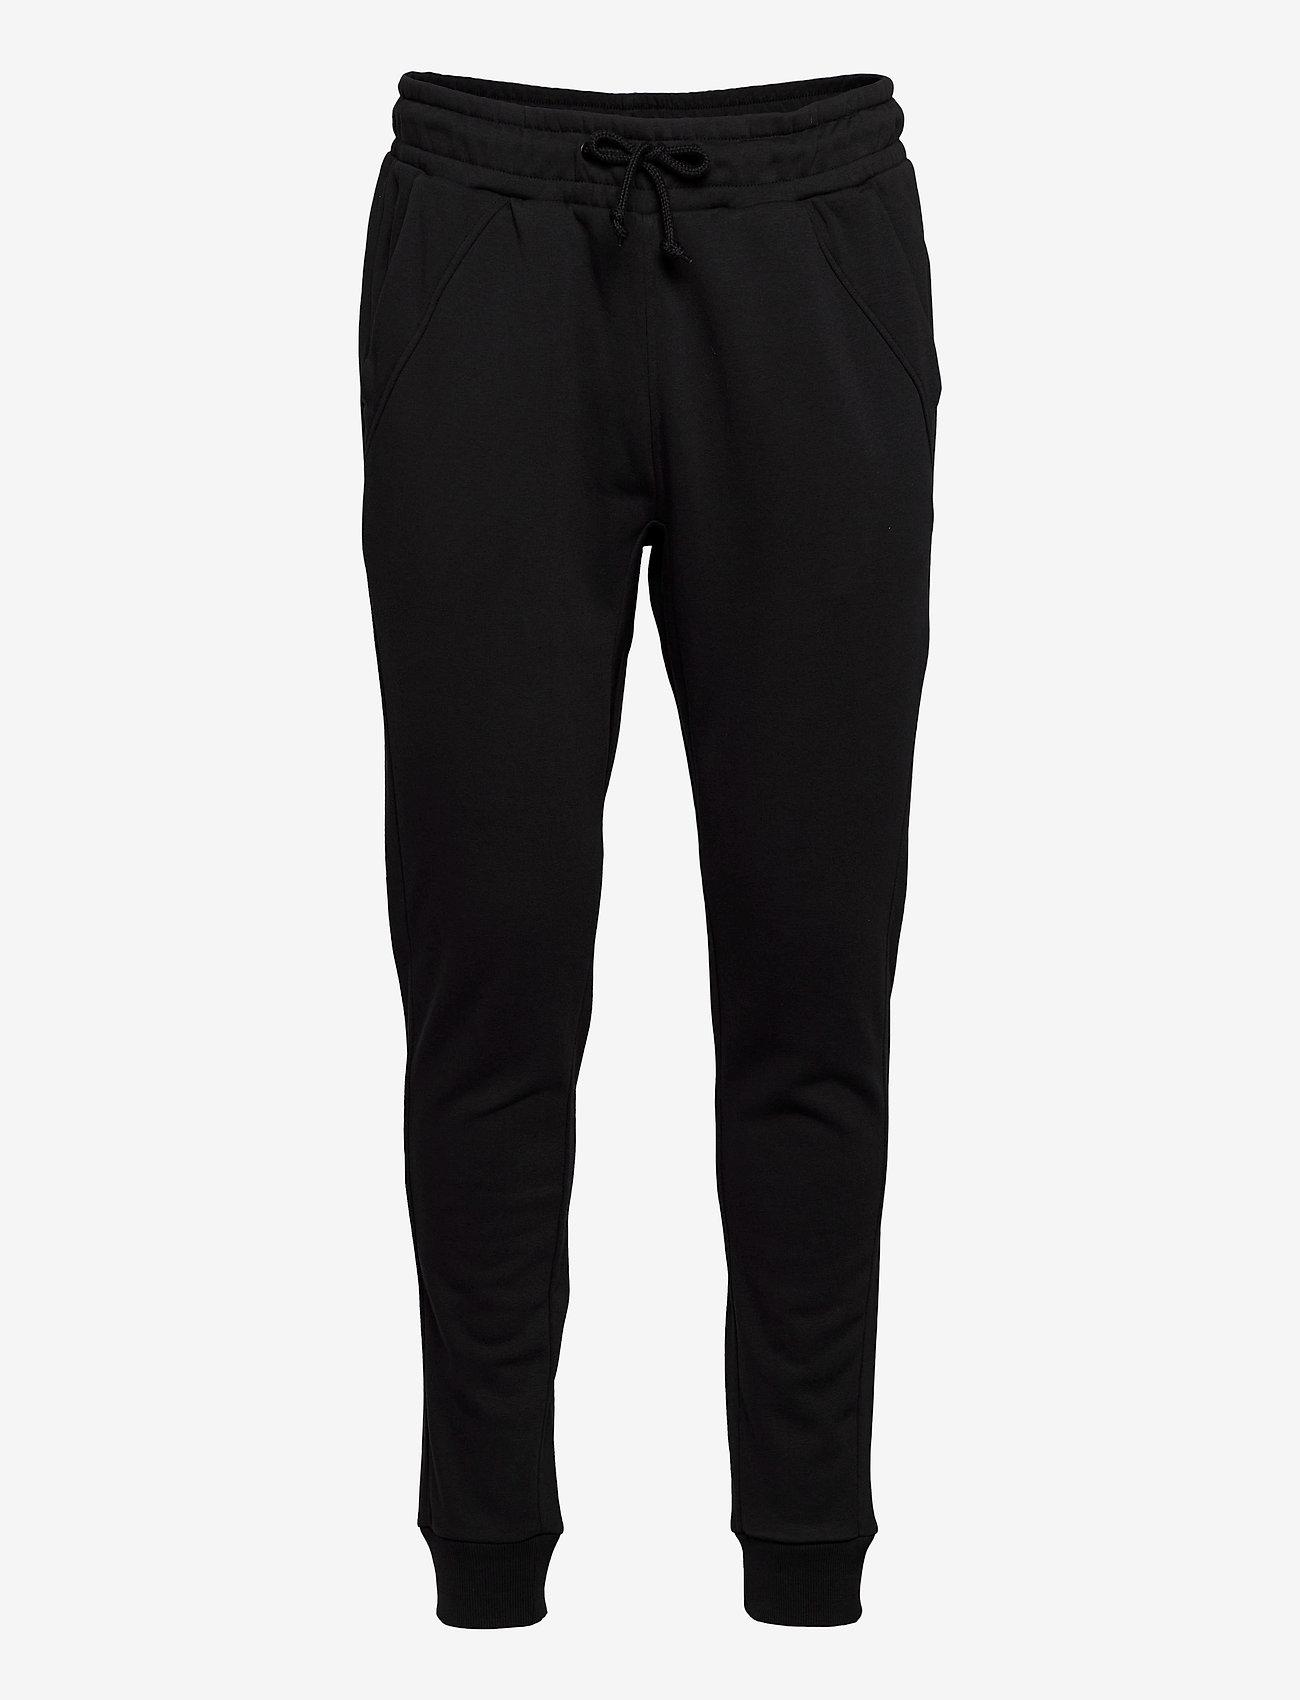 Björn Borg - PANTS SAMUEL SAMUEL - pants - black beauty - 0